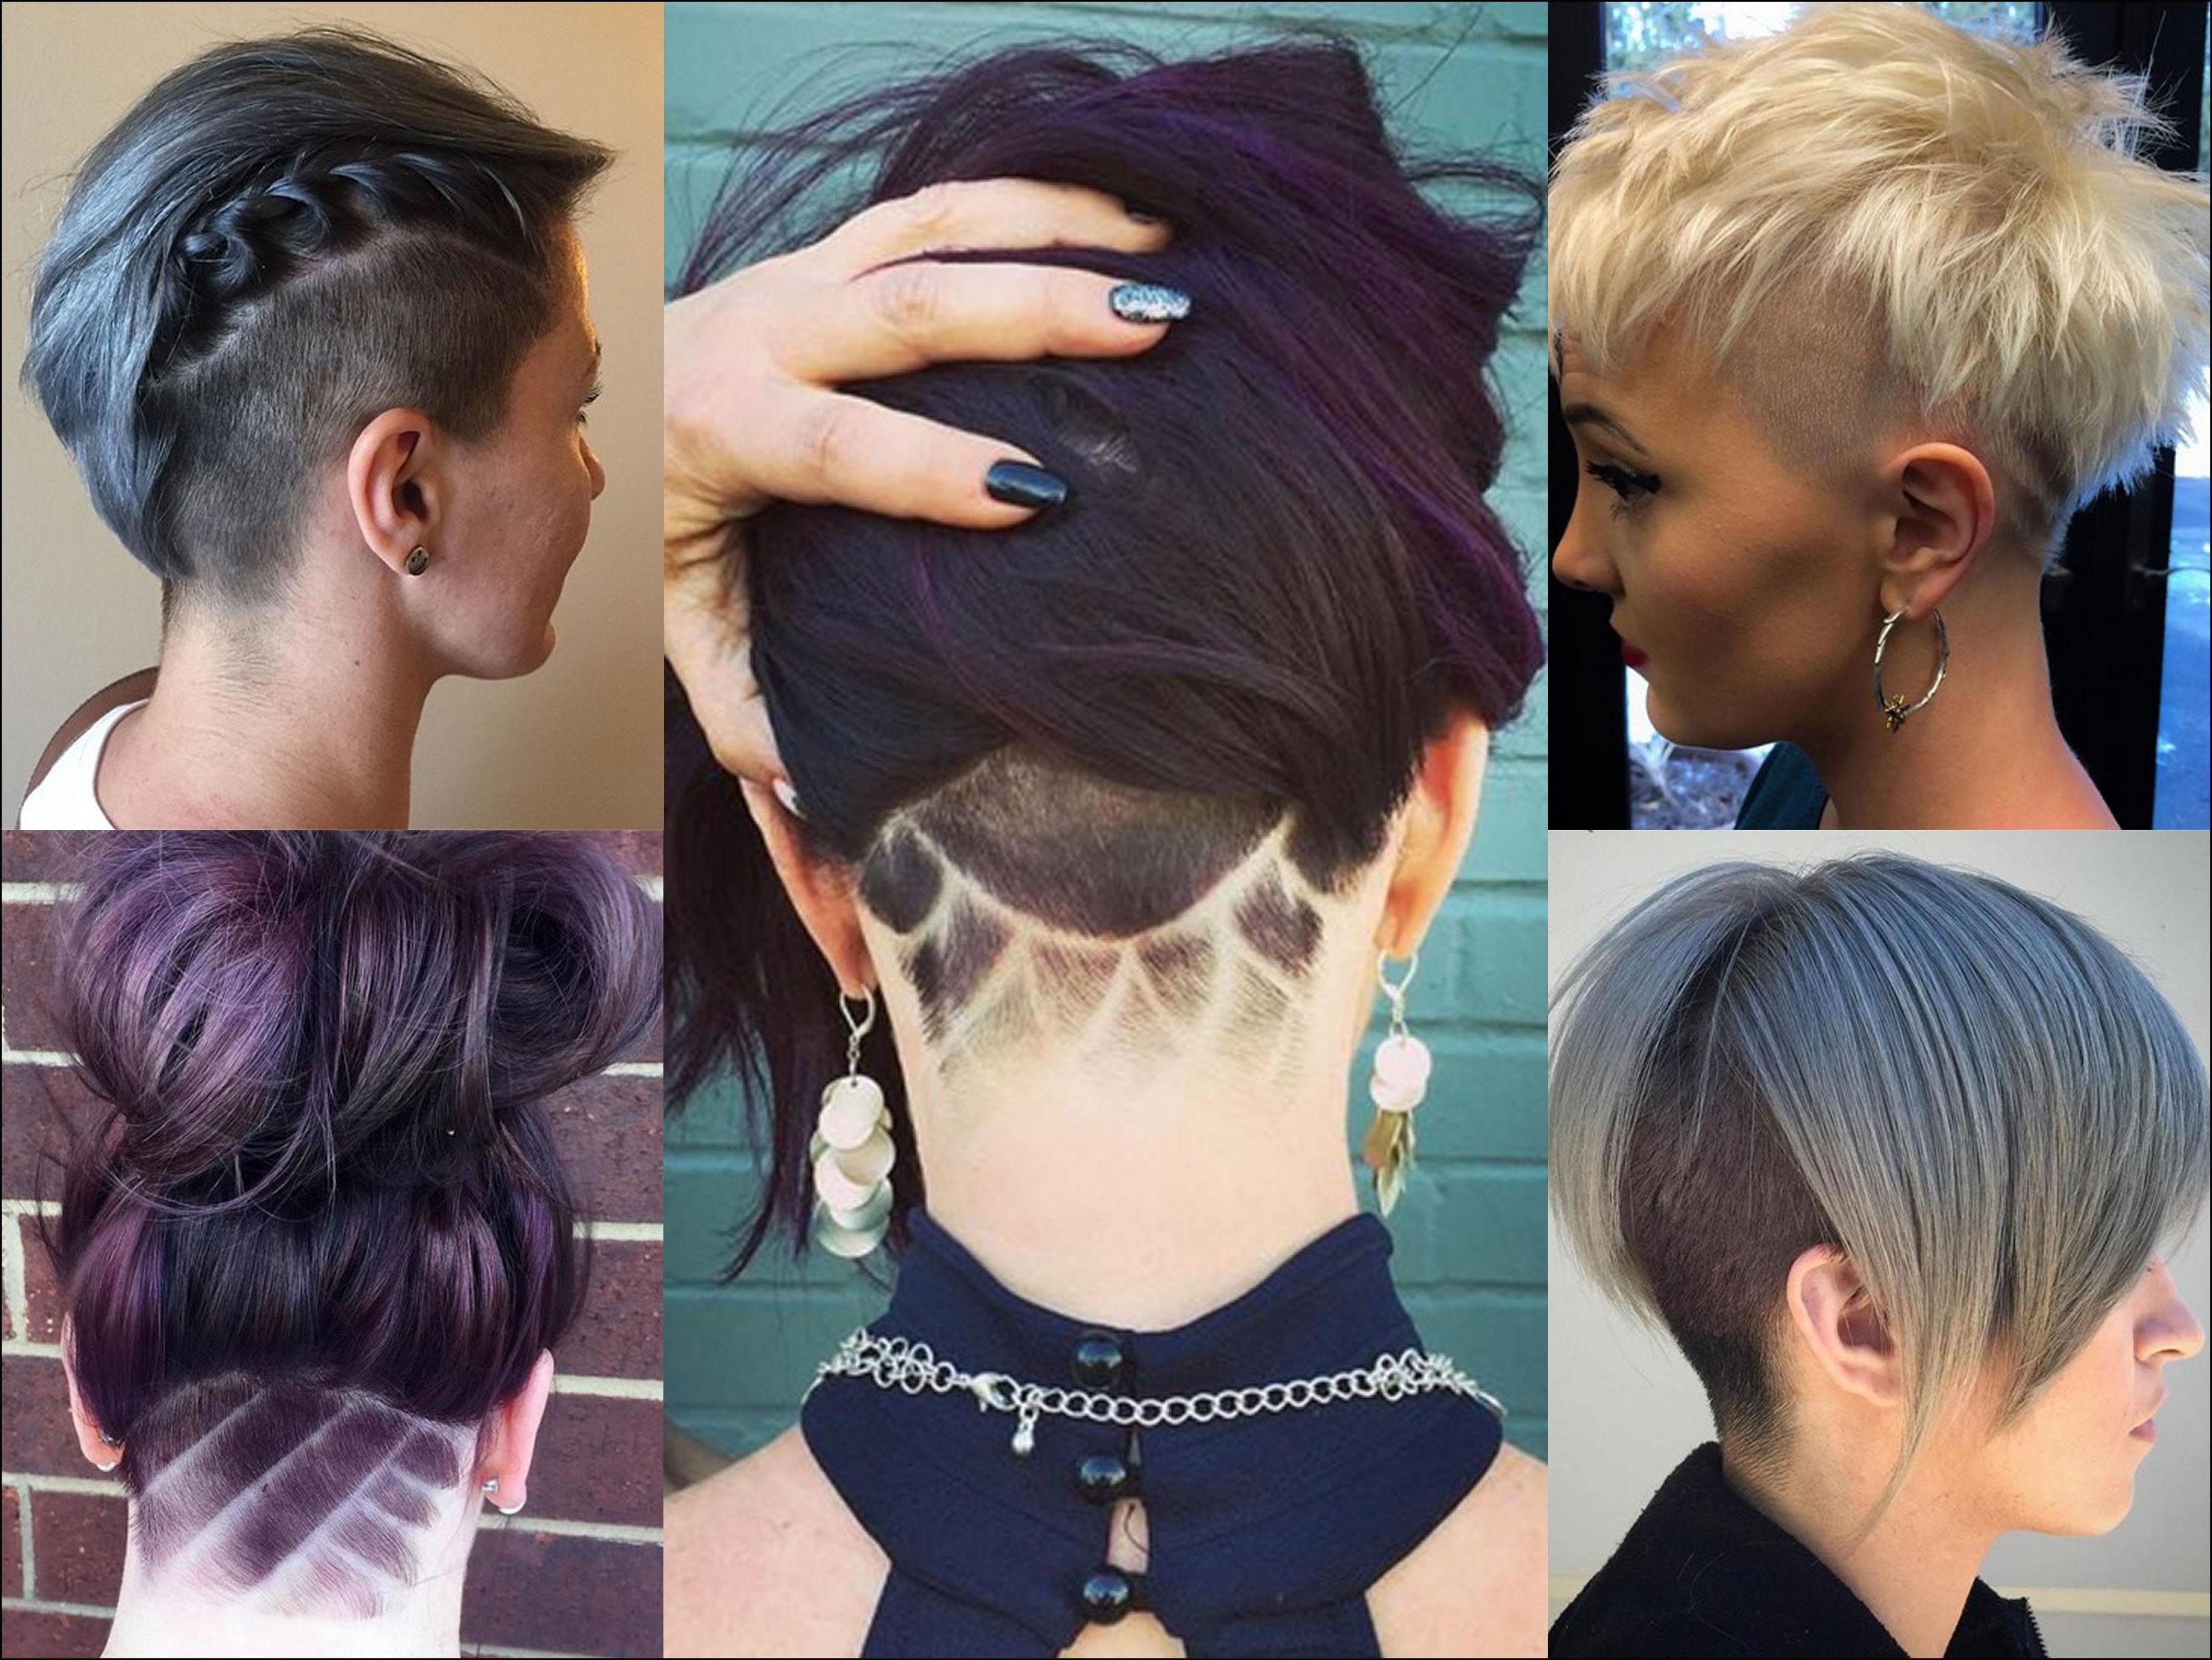 15 Schone Kurze Frisuren Fur Afroamerikanische Frauen Meine Frisuren Long Hair Styles Men Hair Styles Cool Hairstyles